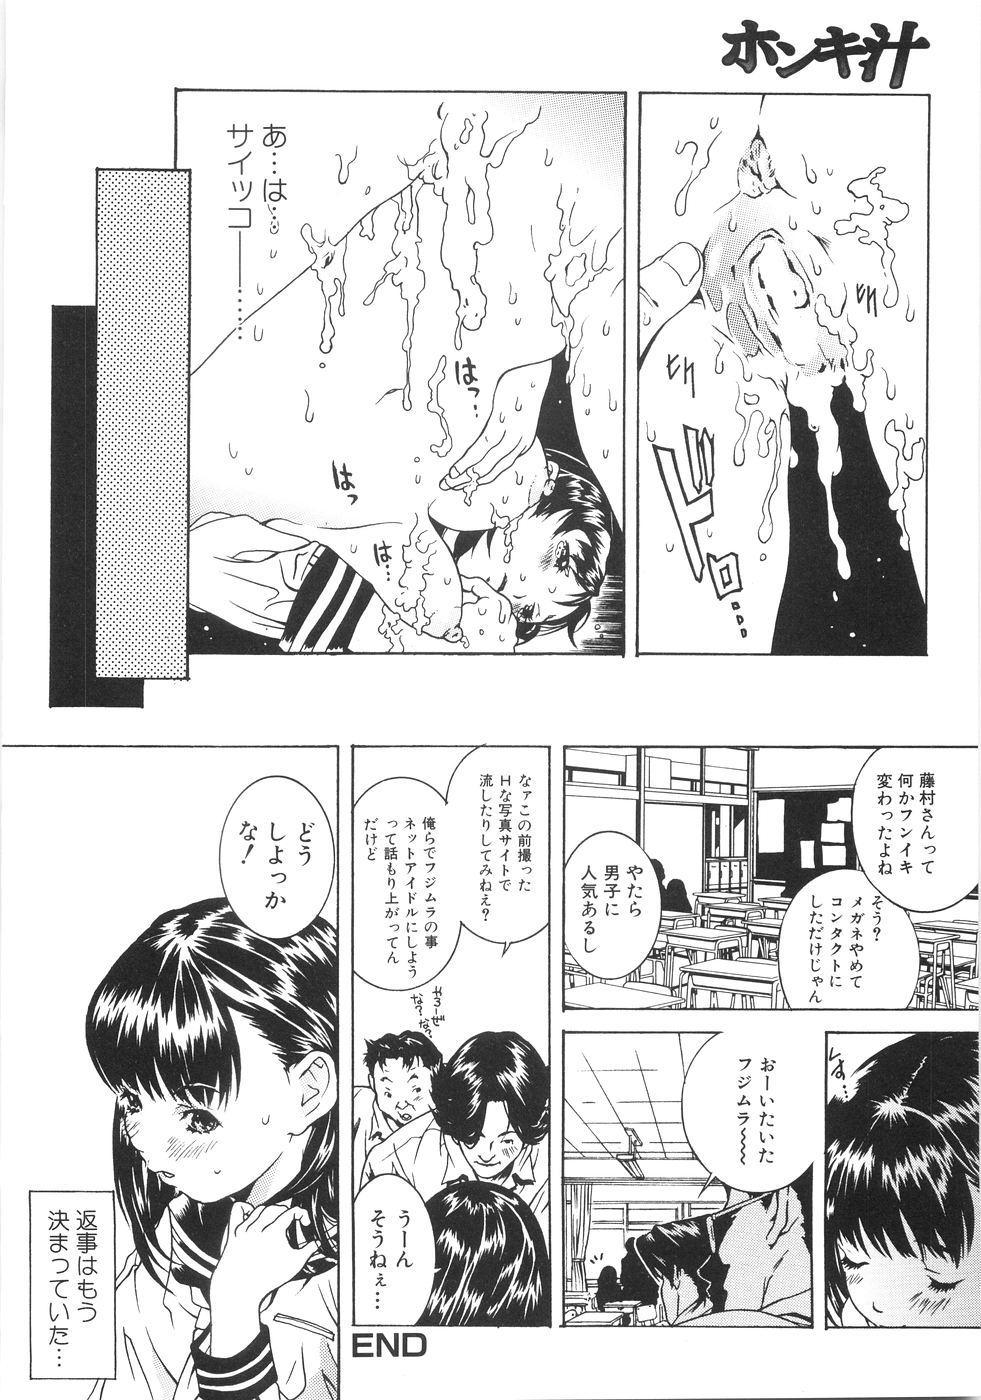 Honki Jiru - Cowper's Gland Liquid? or Love Juice?...?! 148